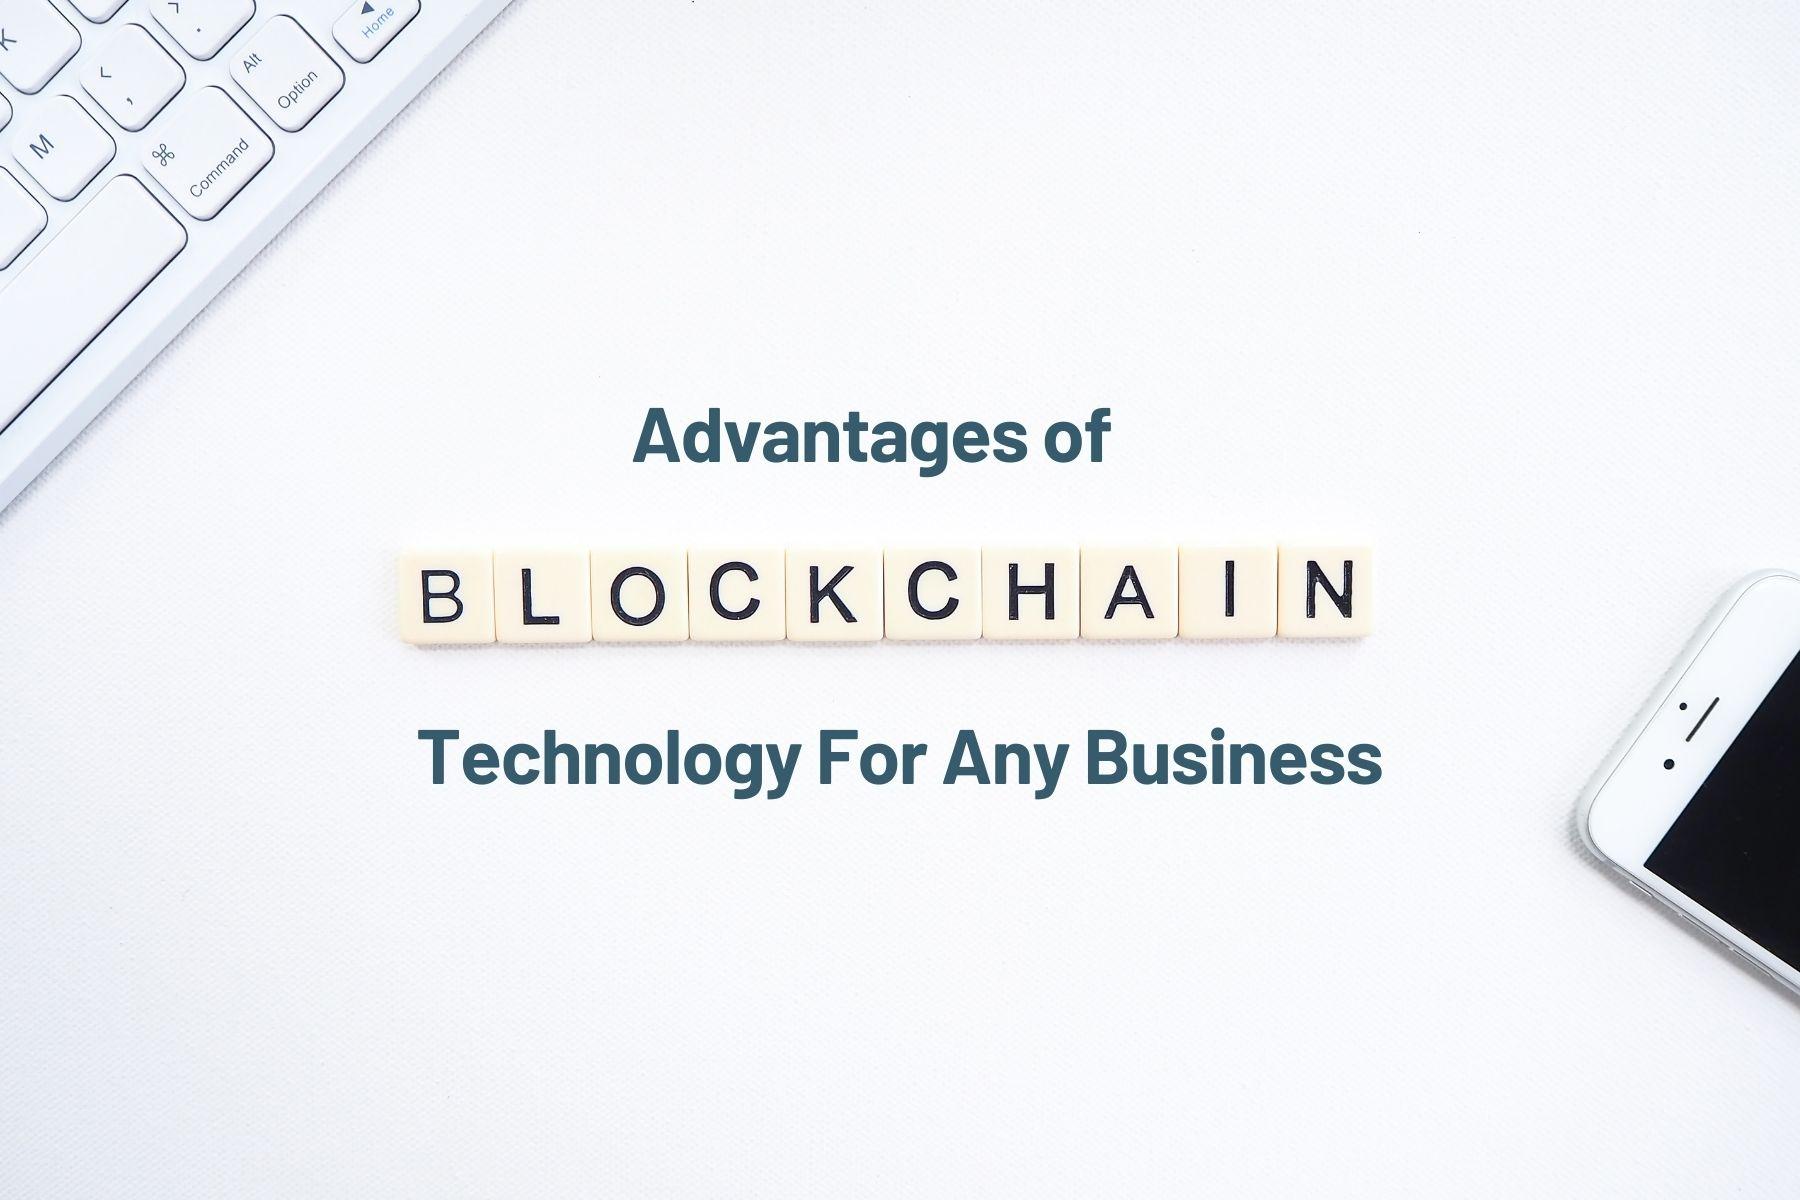 advantages of Blockchain Technology